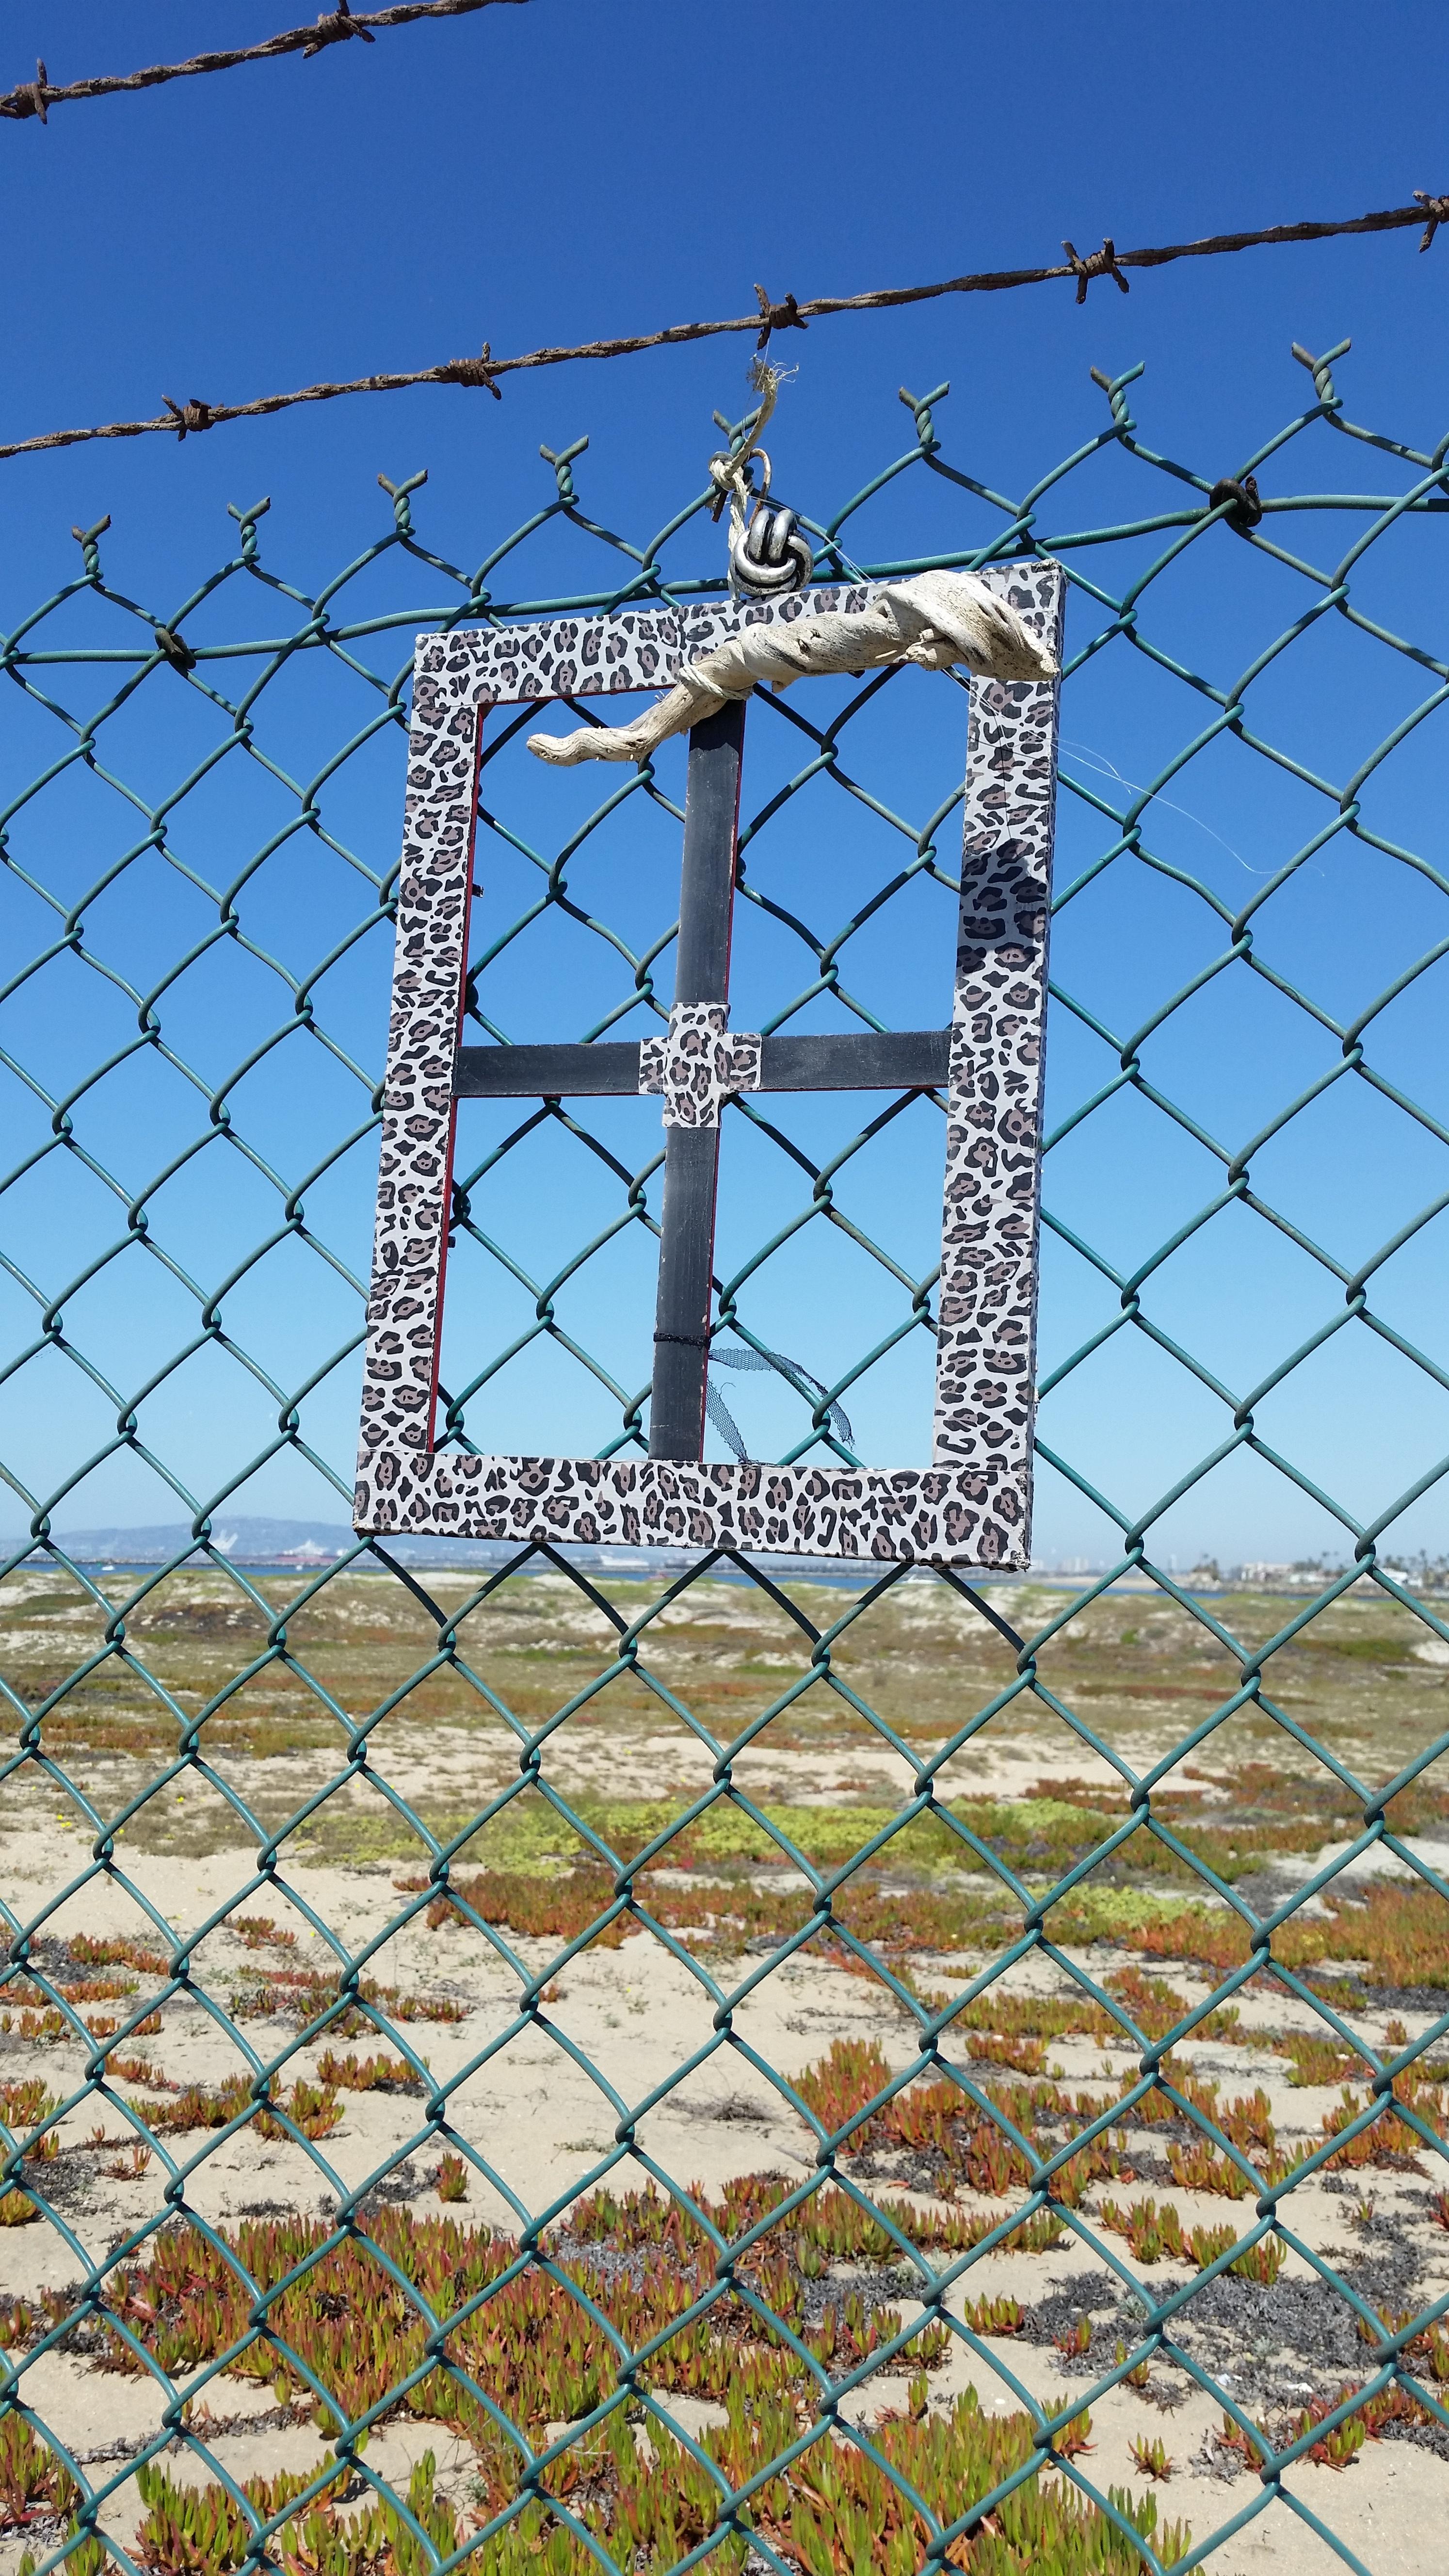 Free Images : beach, line, tower, facade, electricity, art, net ...